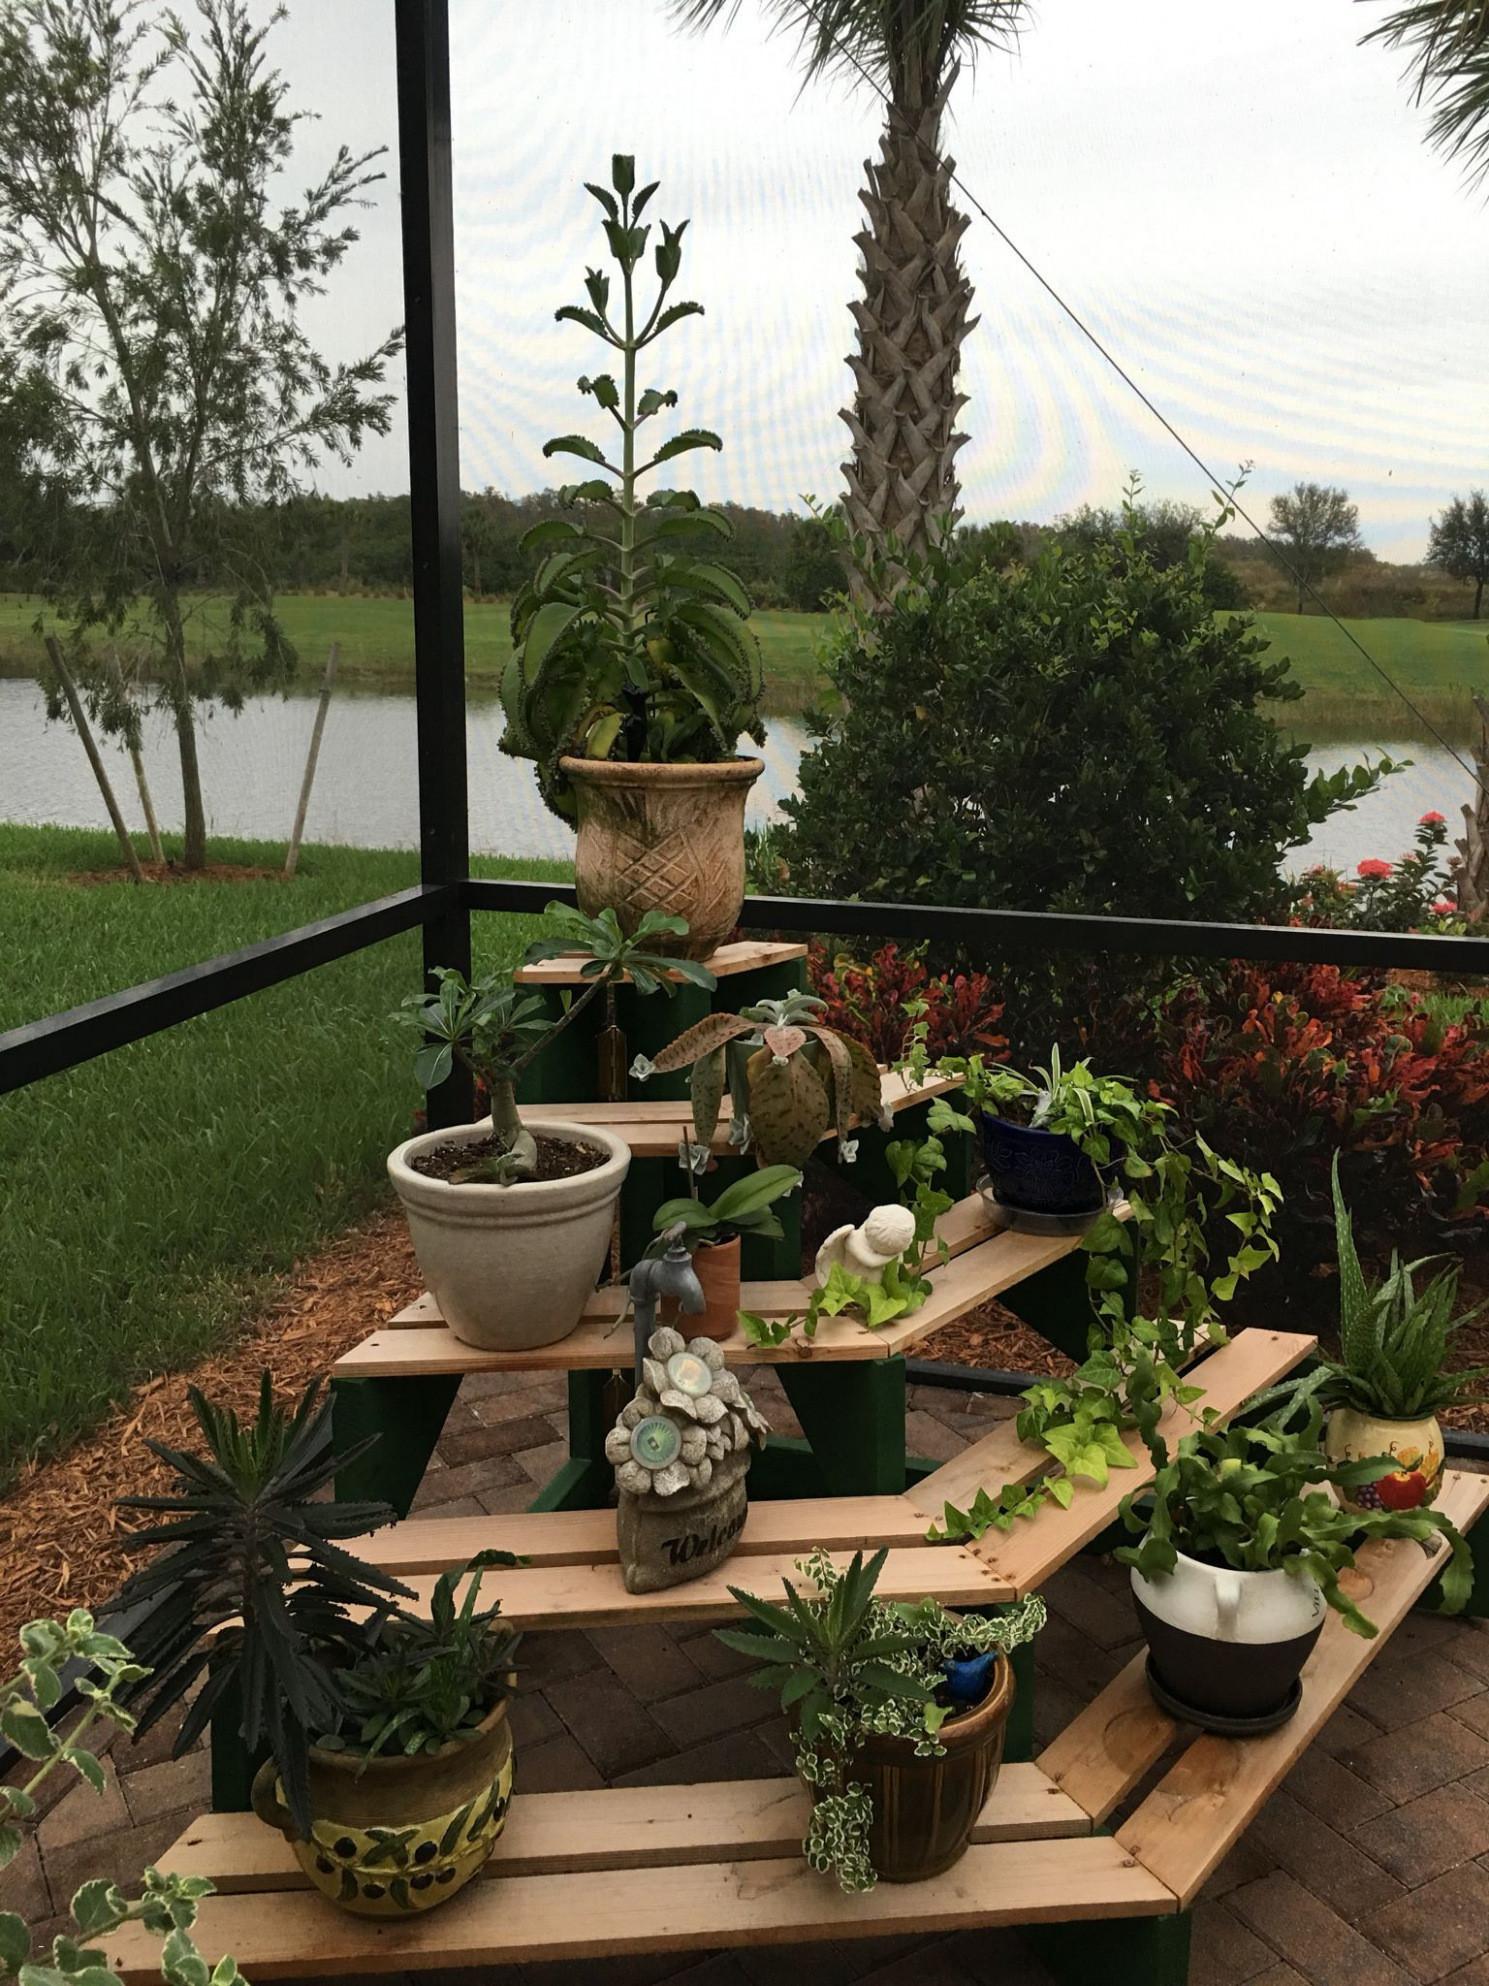 vase water fountain outdoor of 46 luxueux pot a epice apera§u regarding patio plant stands luxury patio flower pots fresh stylowe nowoci od elho